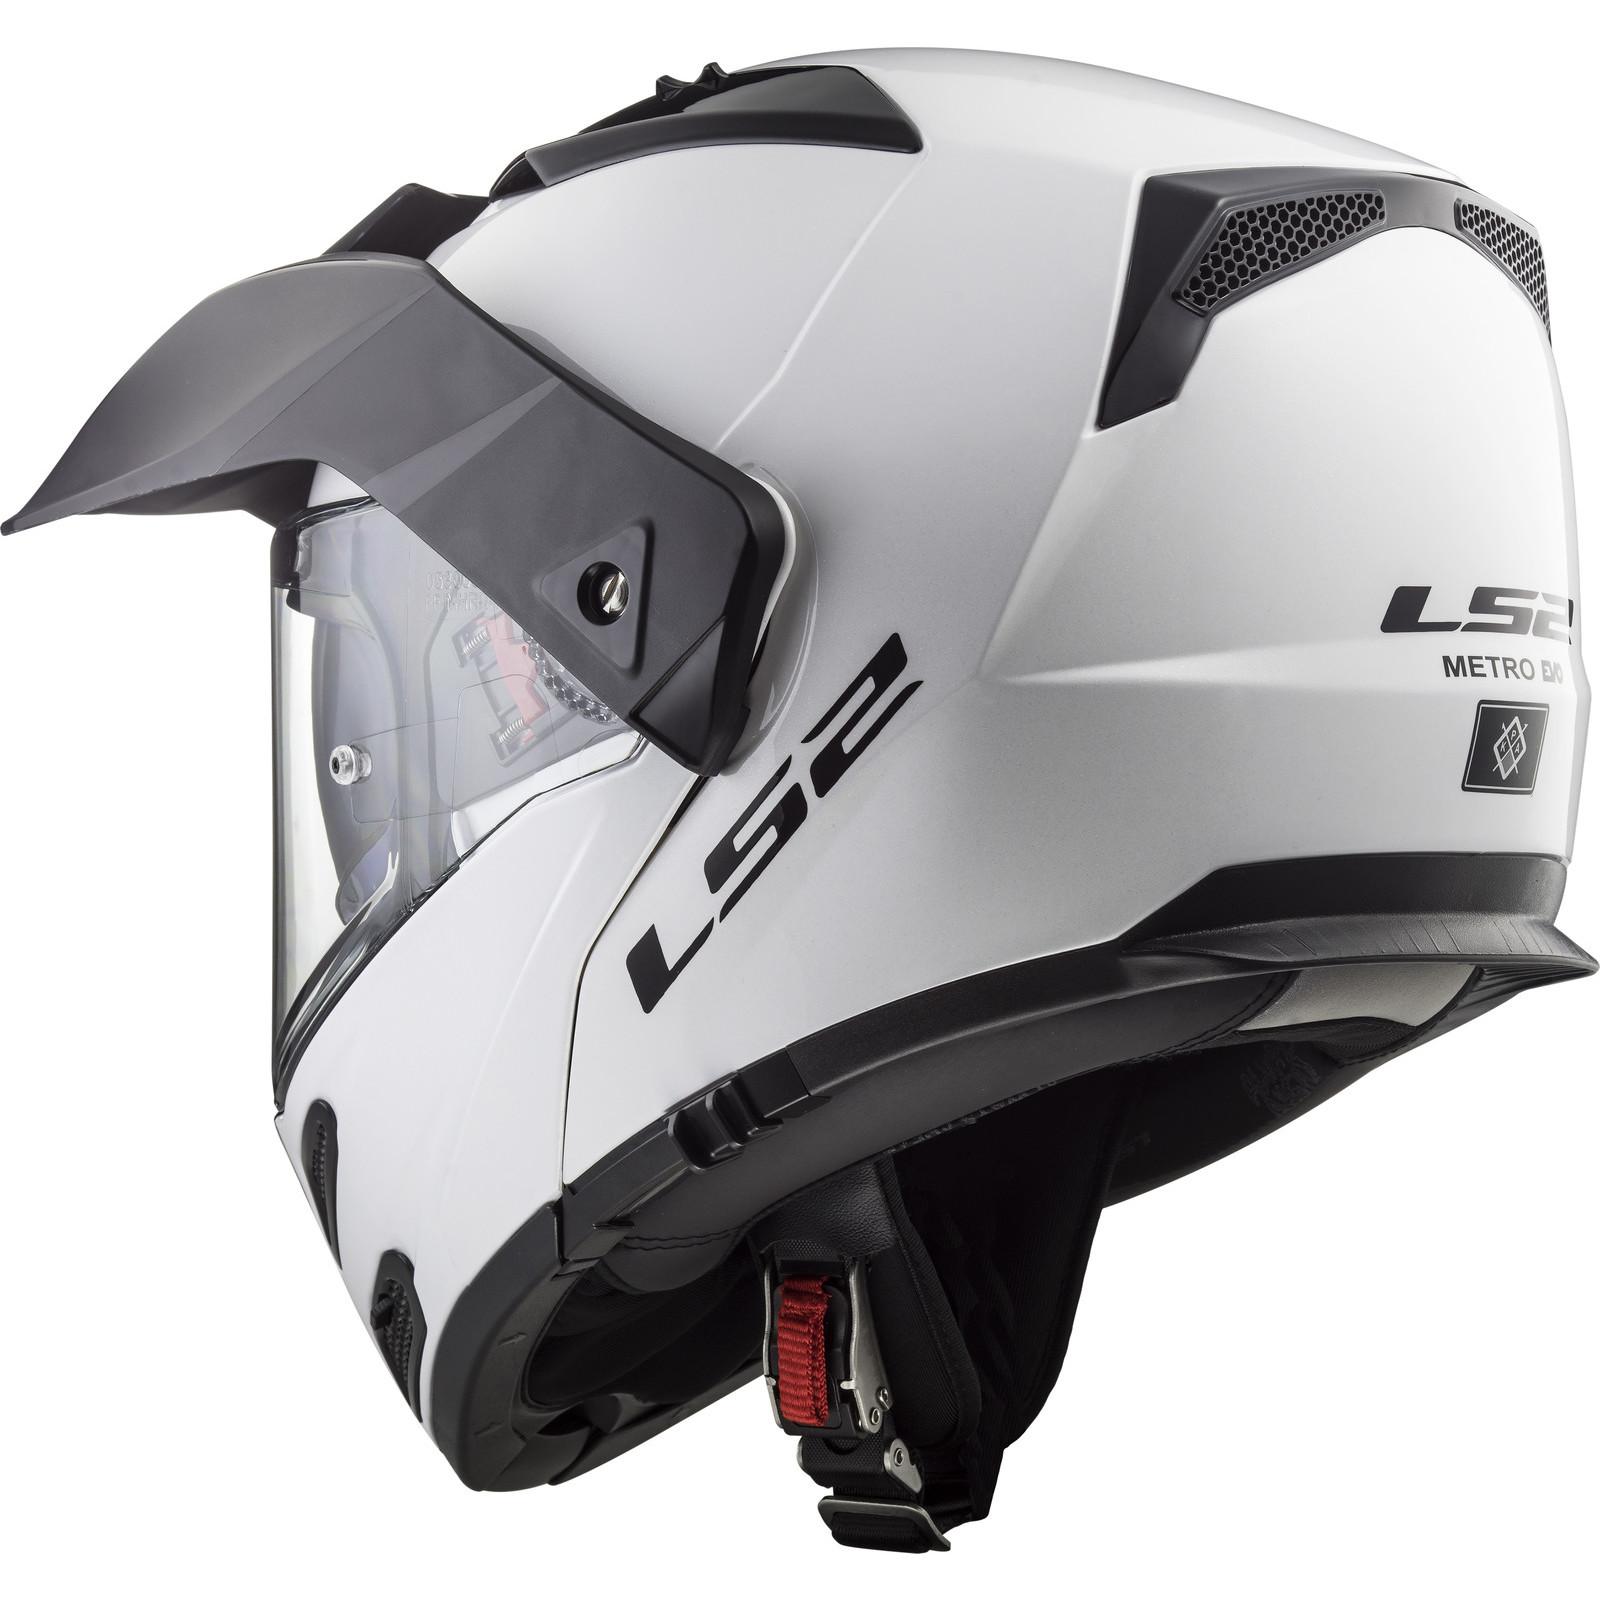 Metro FF324 LS2 Motorcycle Motorbike Road Legal Visor